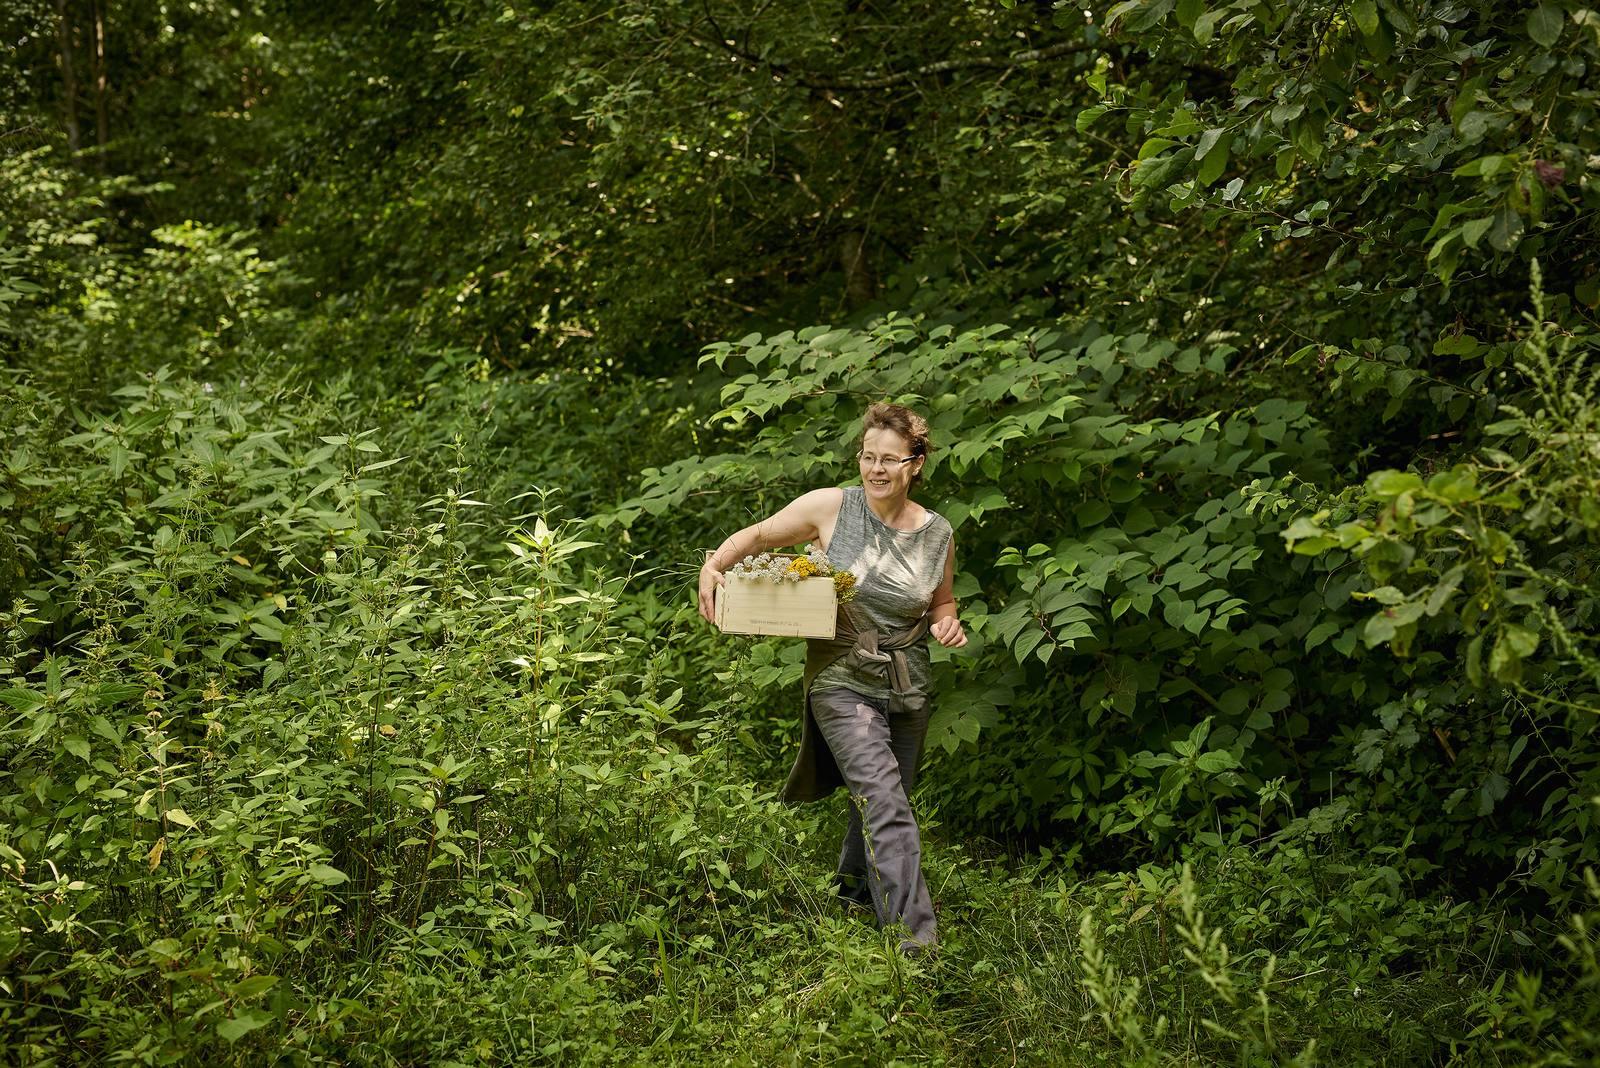 Colette Baechler dans la forêt